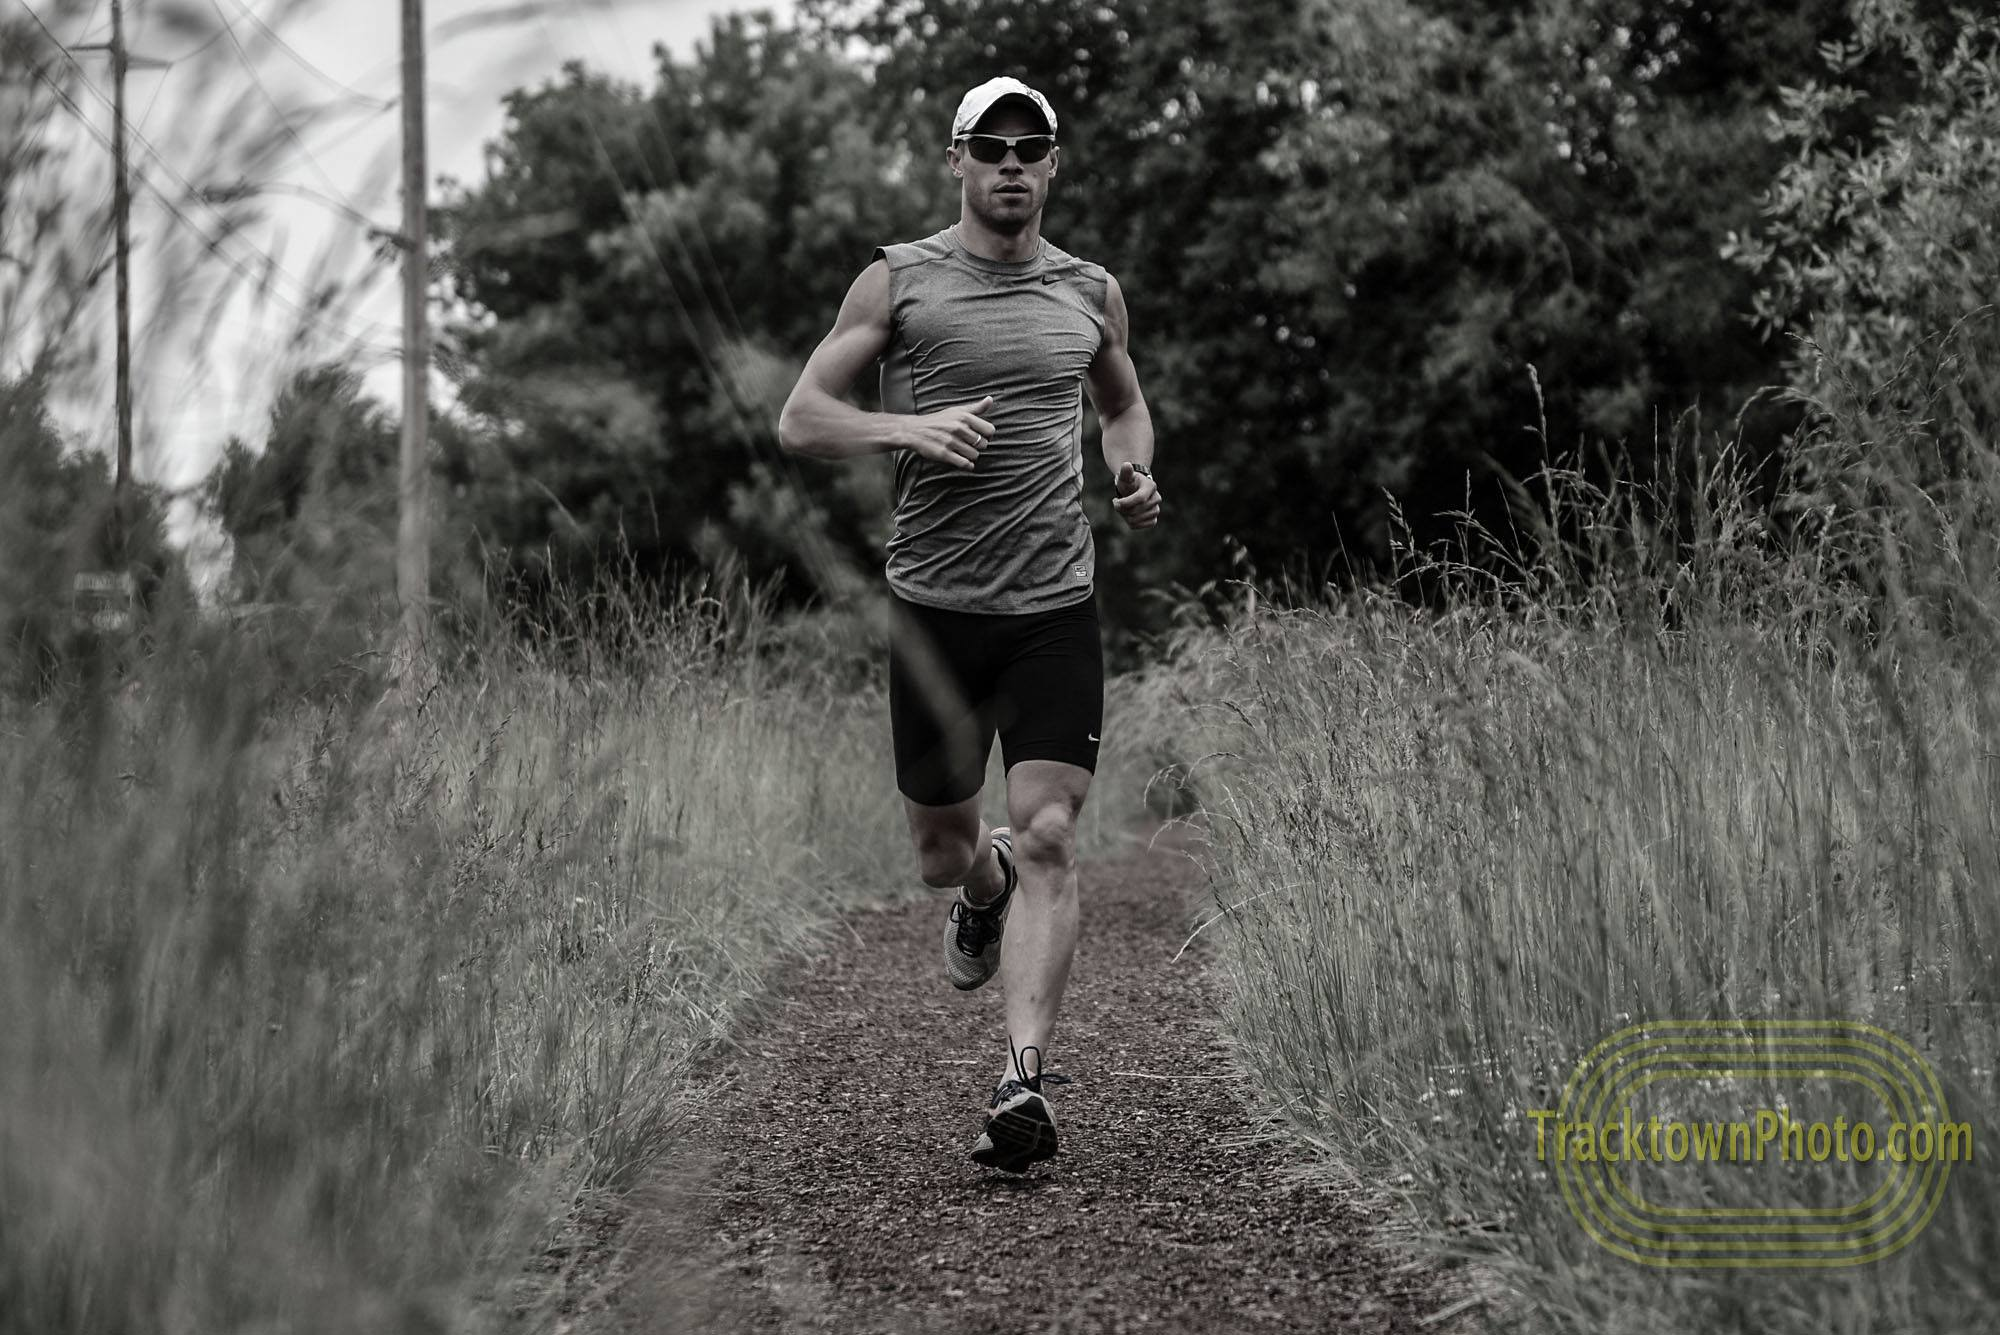 The Monday Morning Run